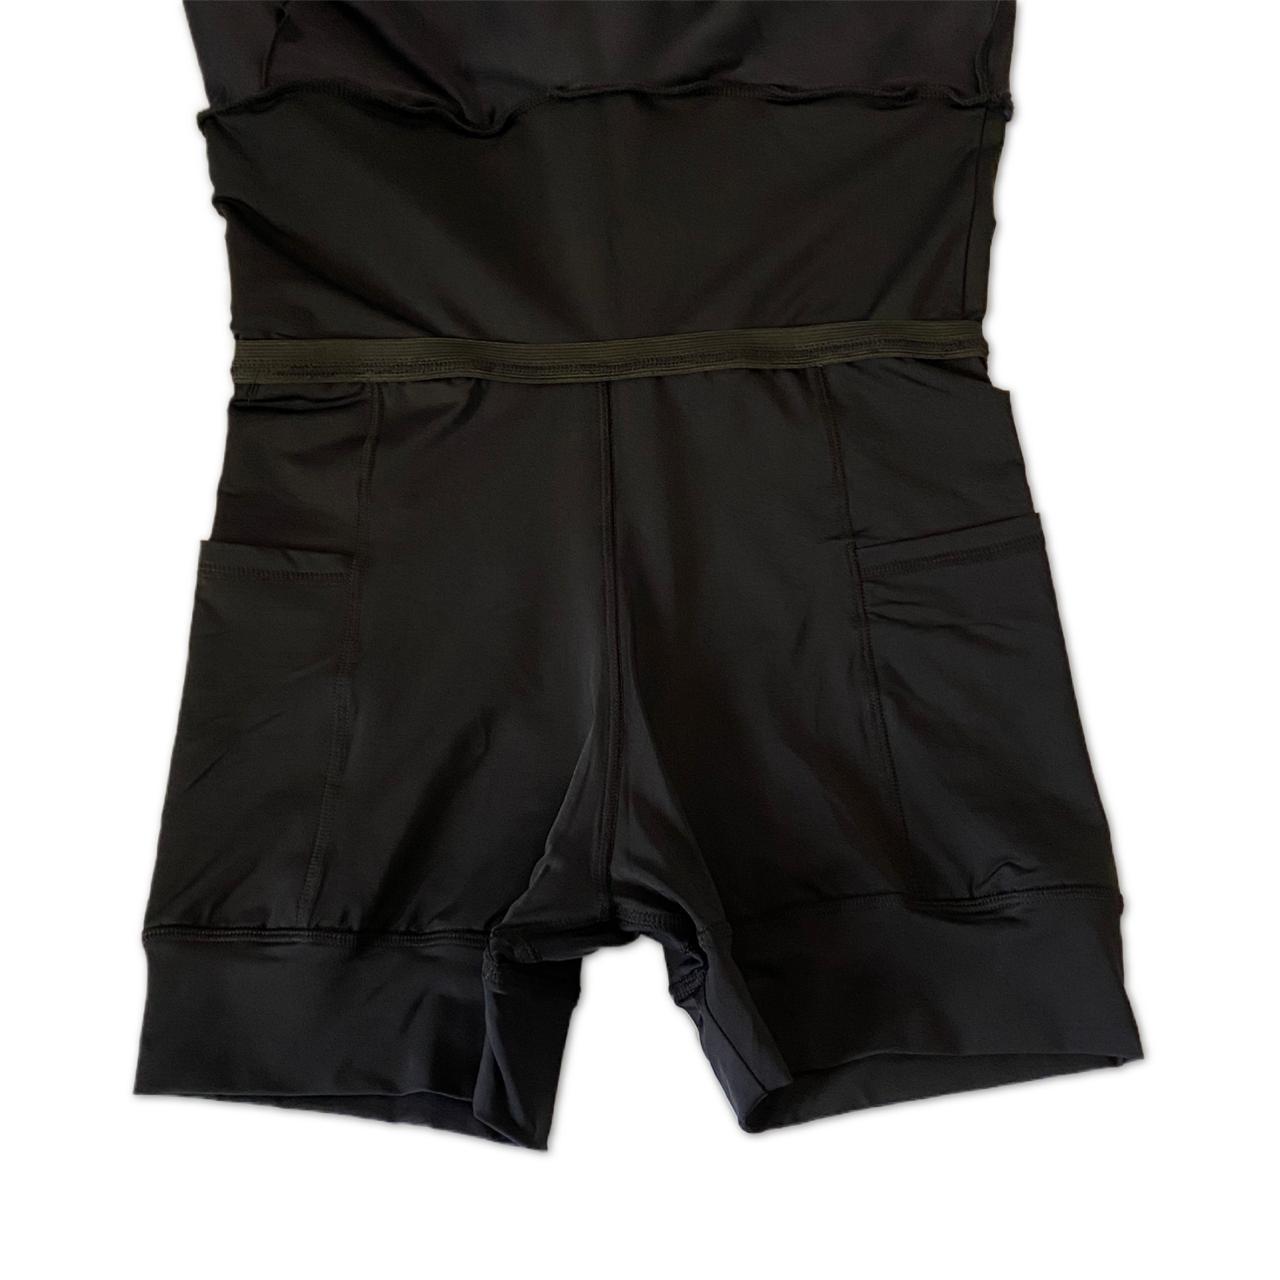 Saia fitness camadas preta ( novo modelo!)  - Vivian Bógus